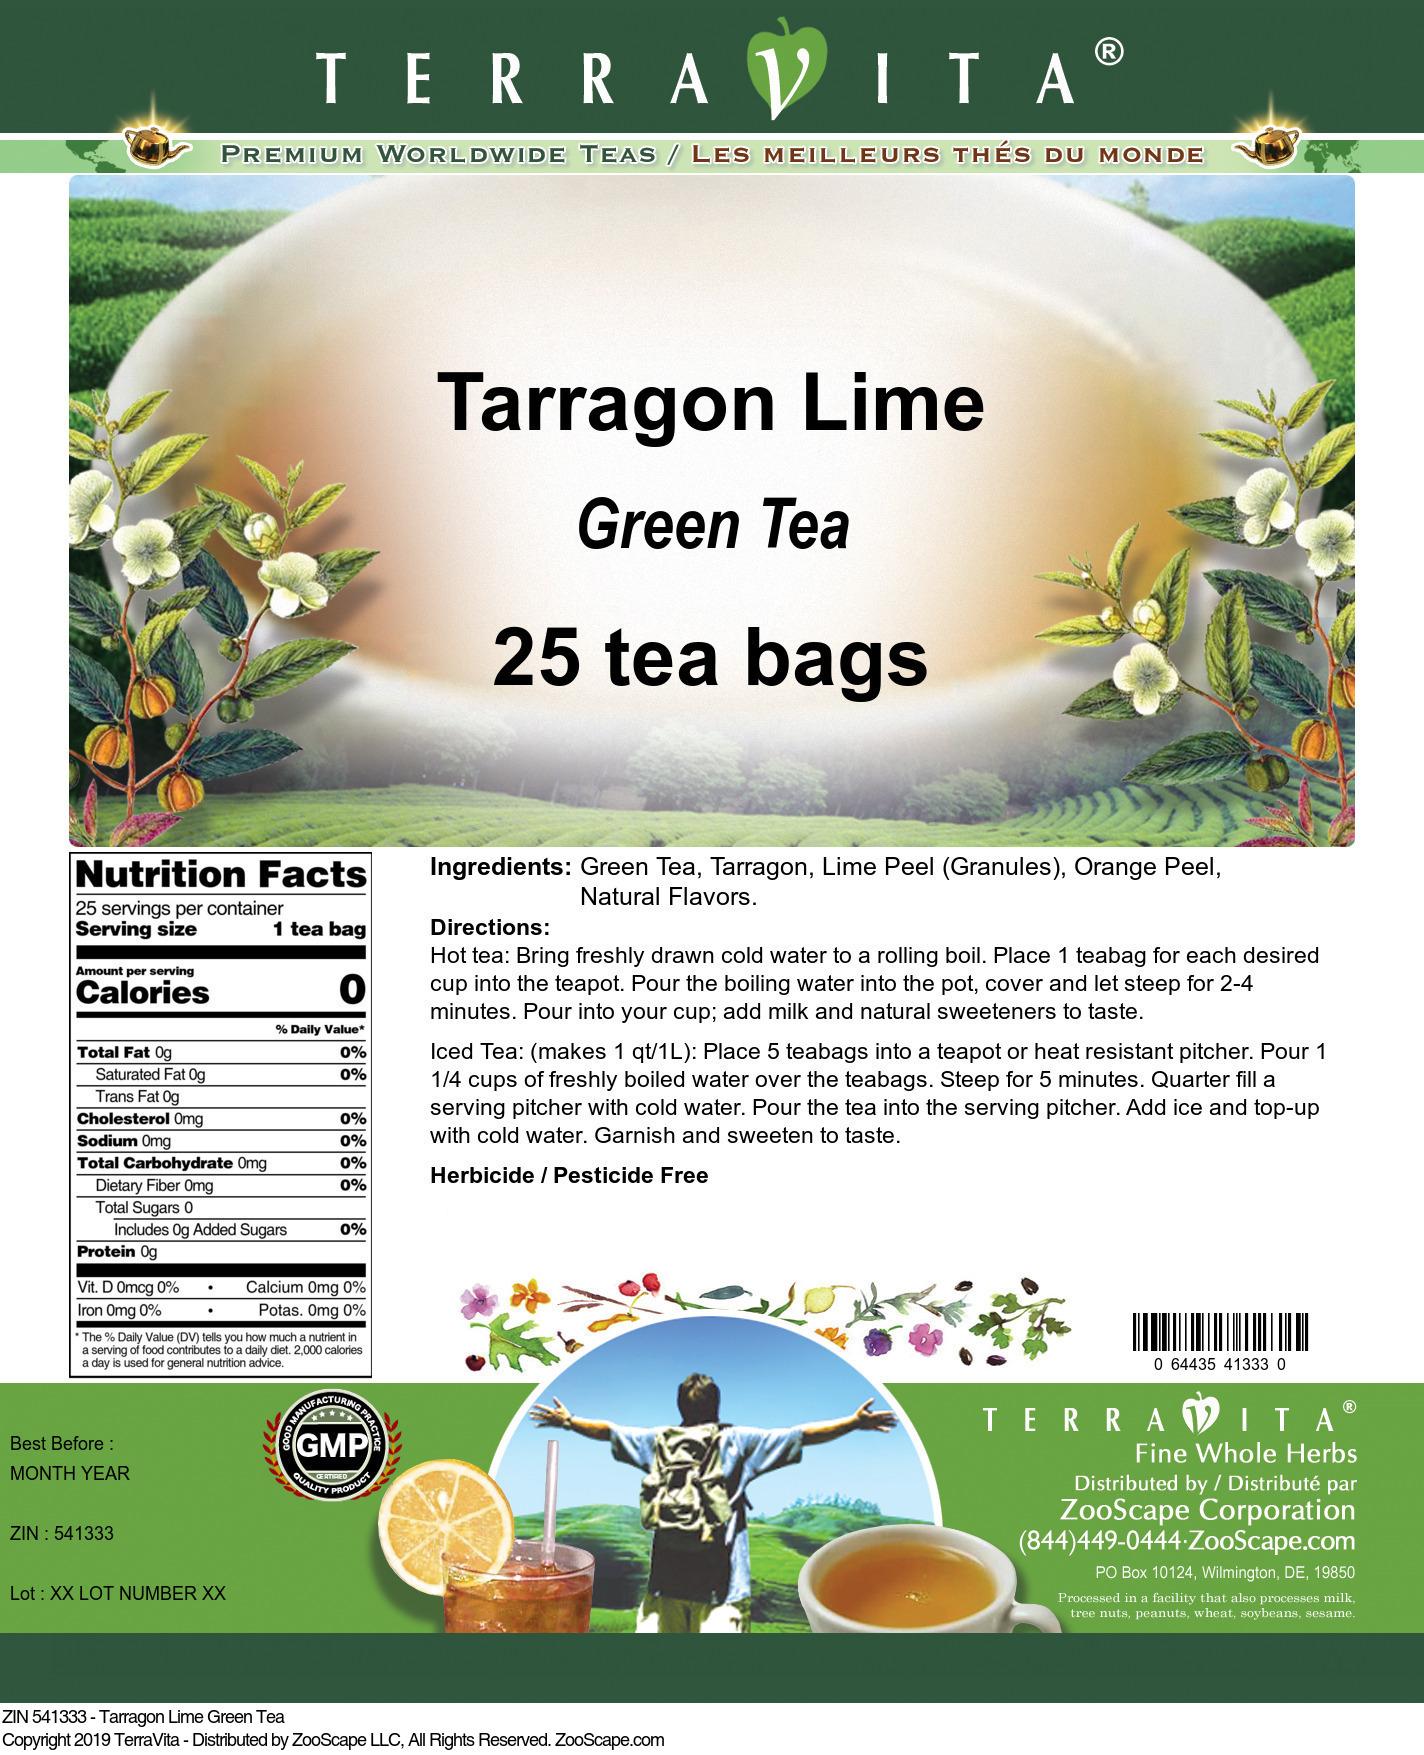 Tarragon Lime Green Tea